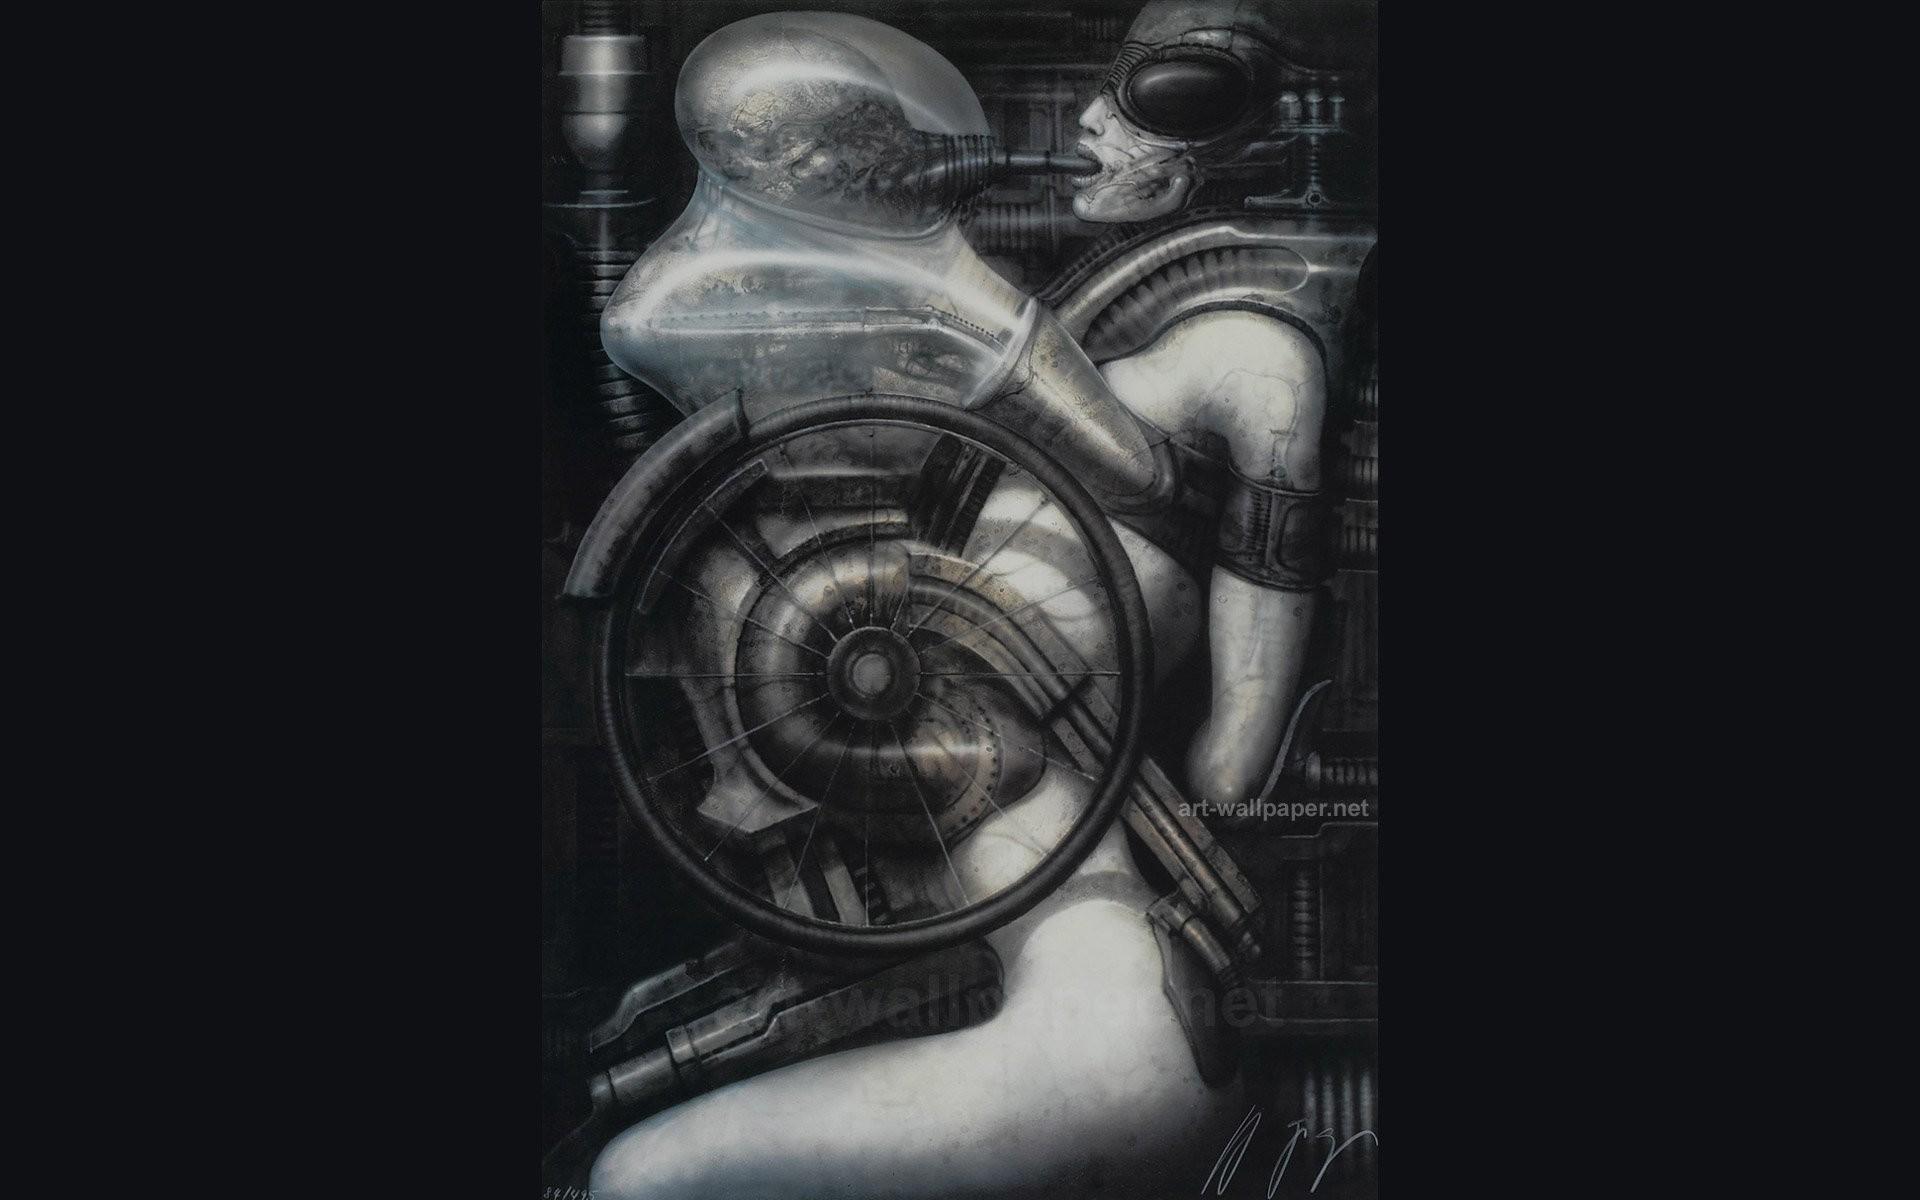 H R Giger Art Artwork Dark Evil Artistic Horror Fantasy Sci-fi Alien Aliens  Xenomorph Wallpaper At Dark Wallpapers